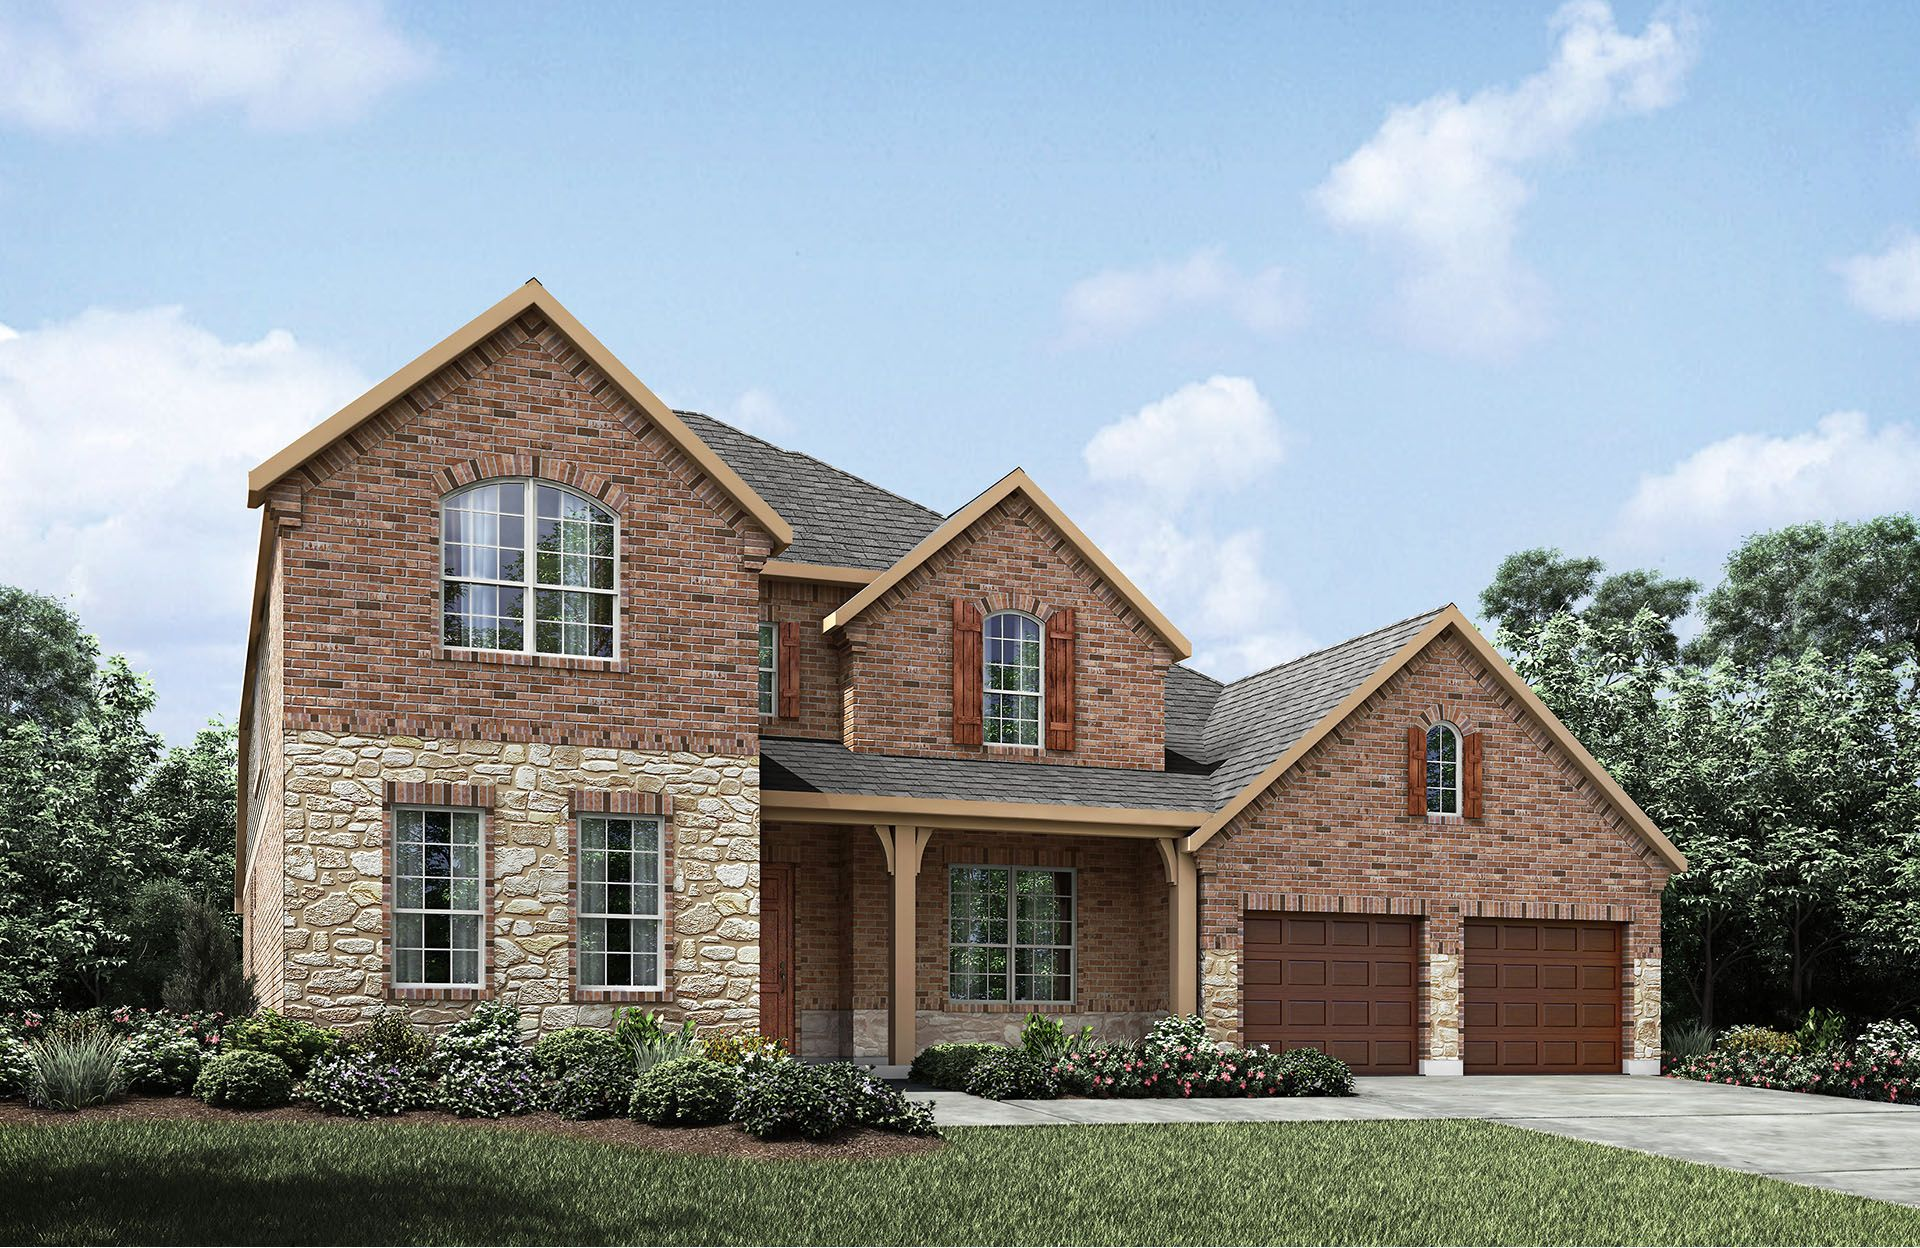 Single Family for Sale at Union Park - Crestmoore Ii 4908 Union Park Boulevard East Aubrey, Texas 76227 United States